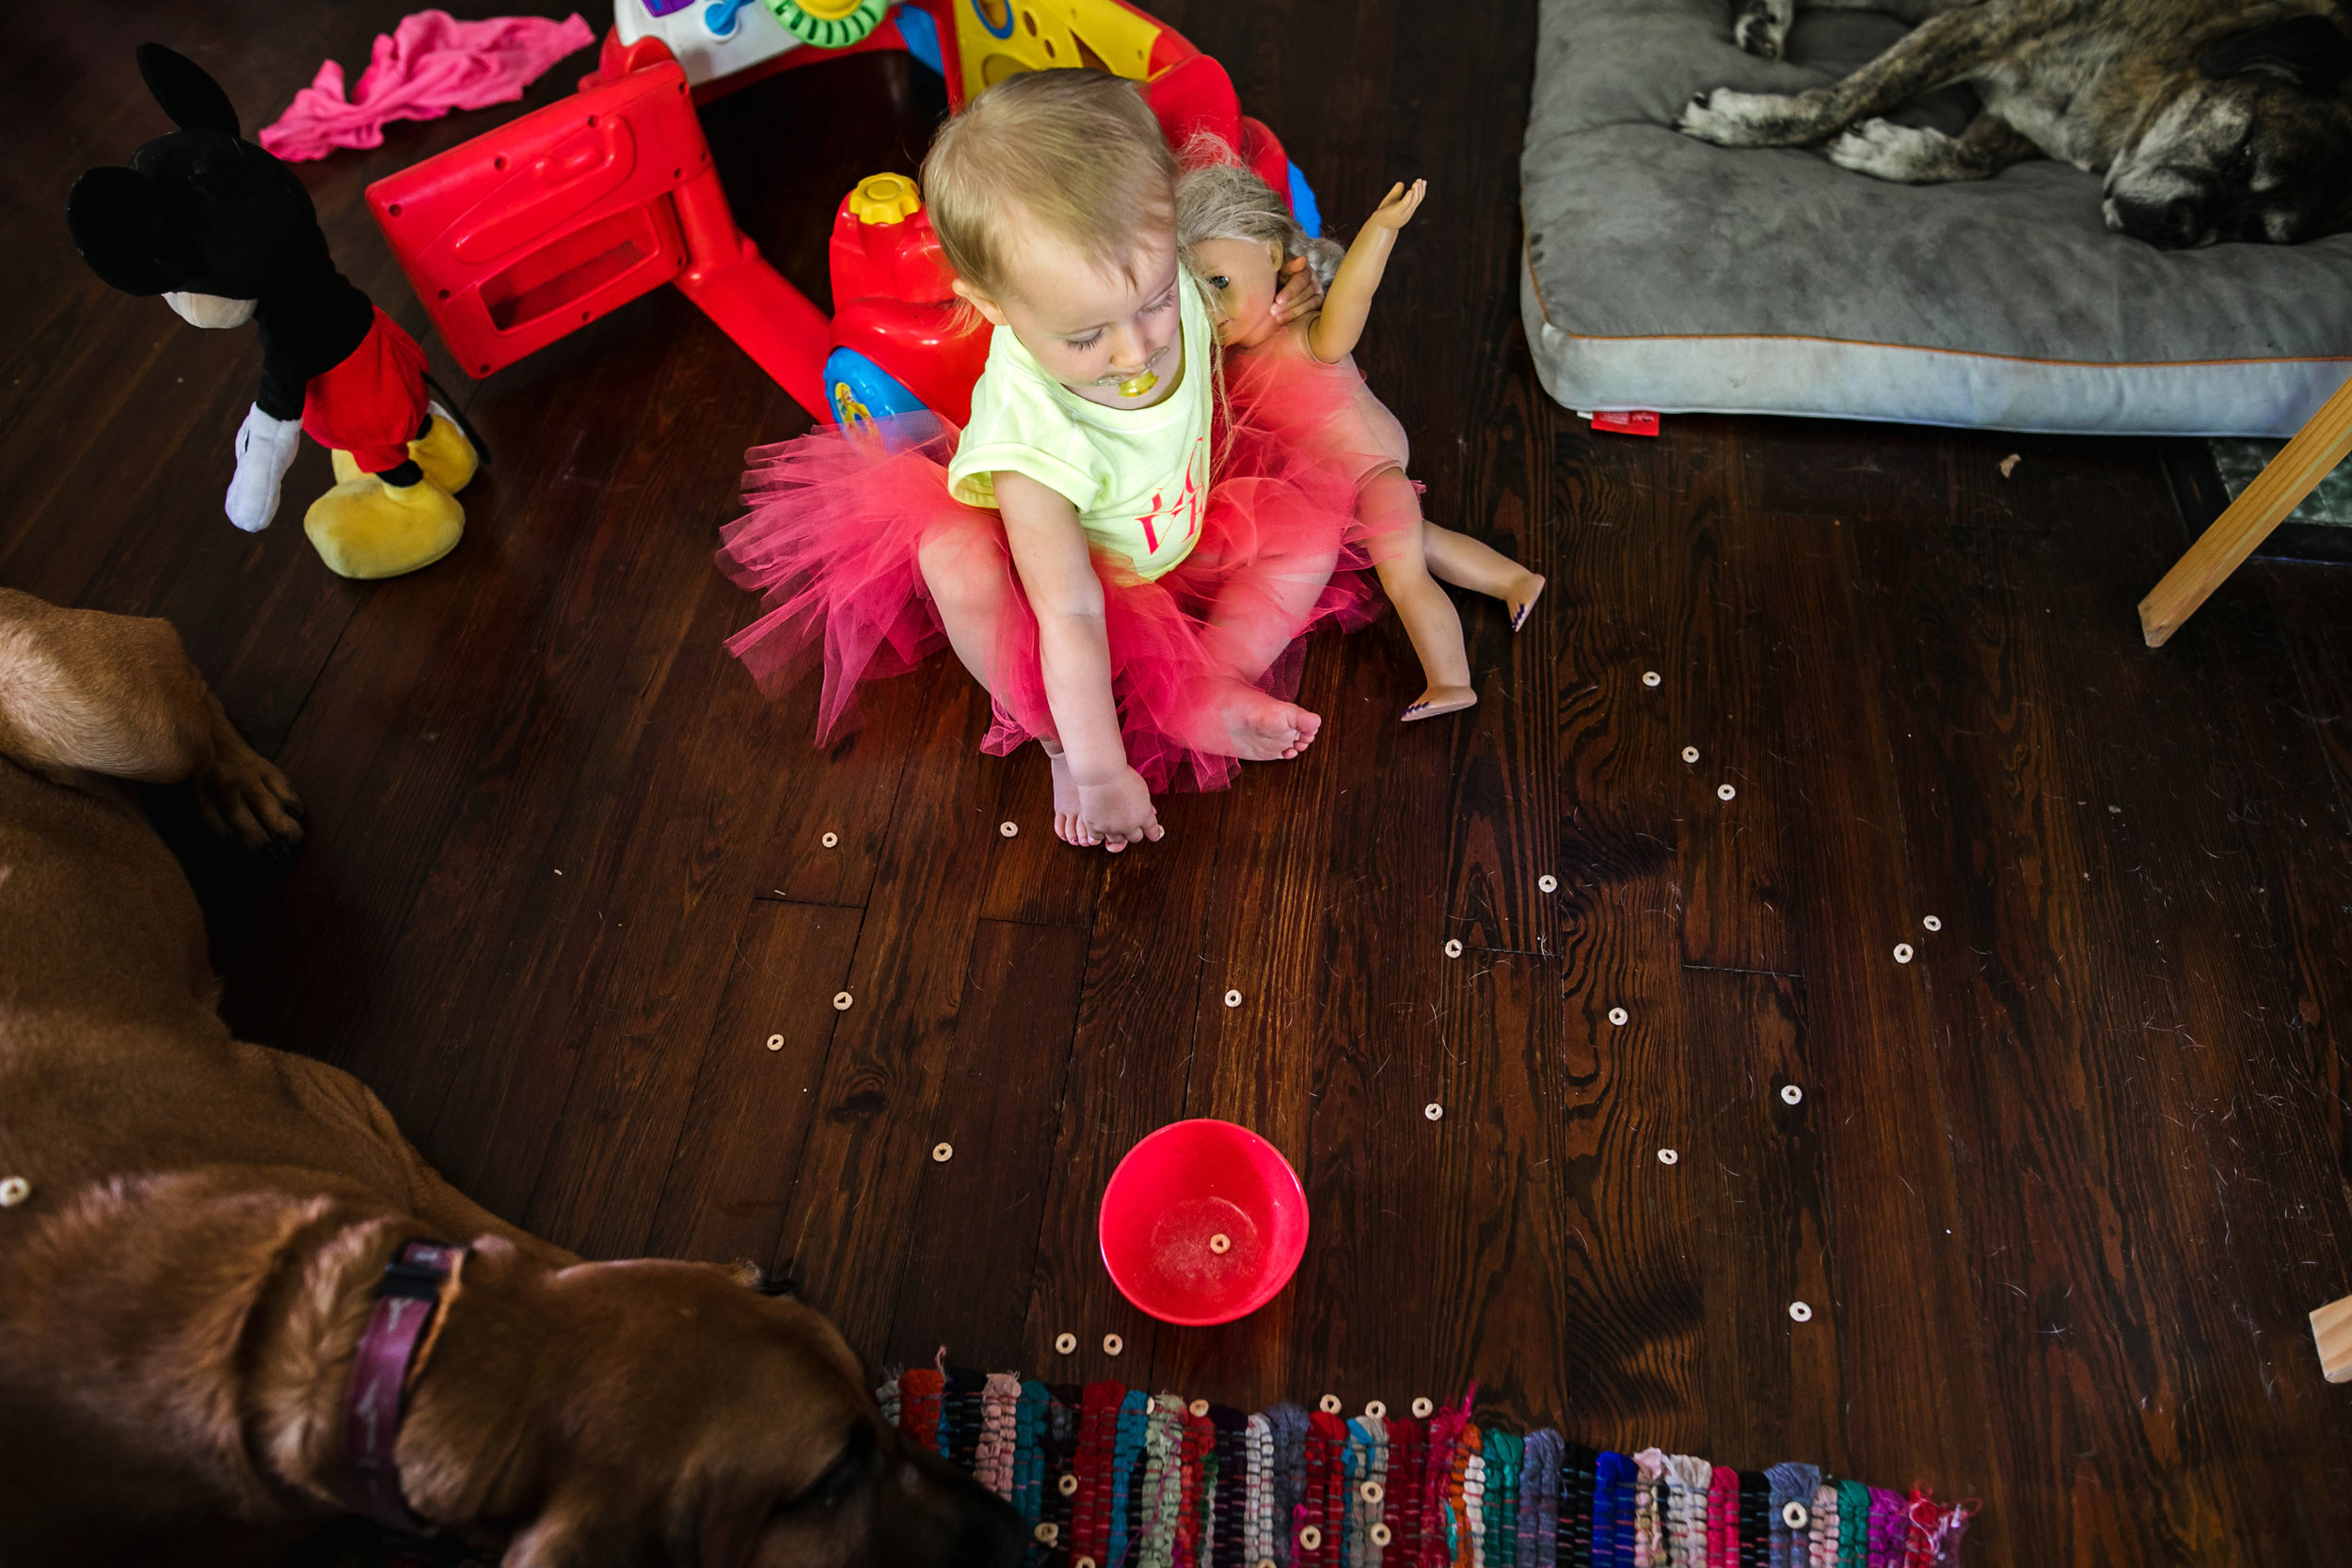 baby spills a snack on living room floor-(ZF-0126-04493-1-054).jpg